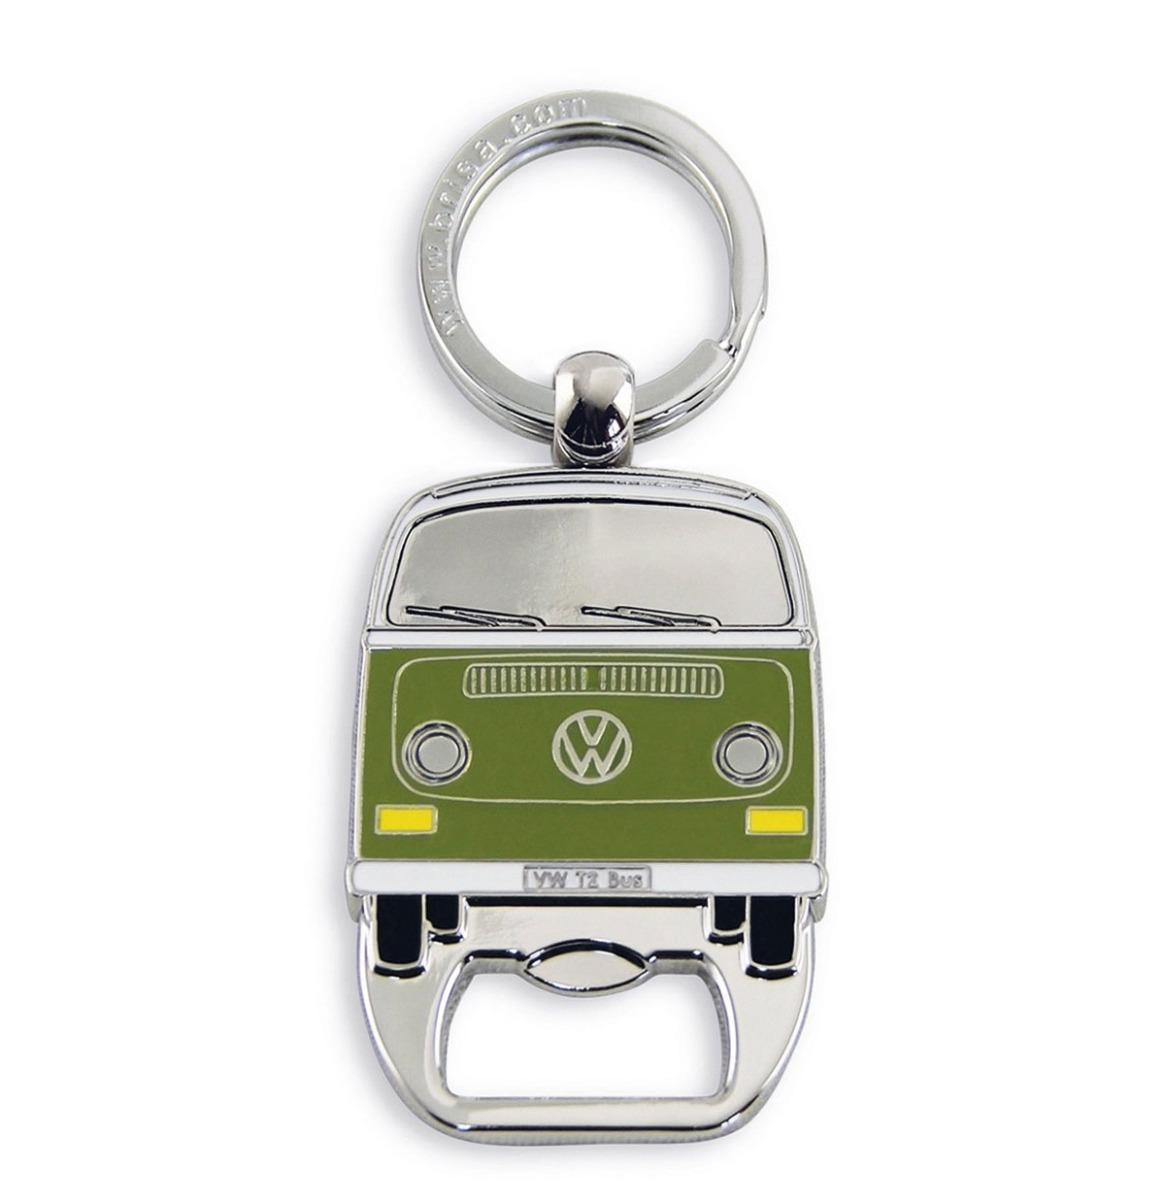 VW Volkswagen T2 Sleutelhanger En Flessenopener Groen